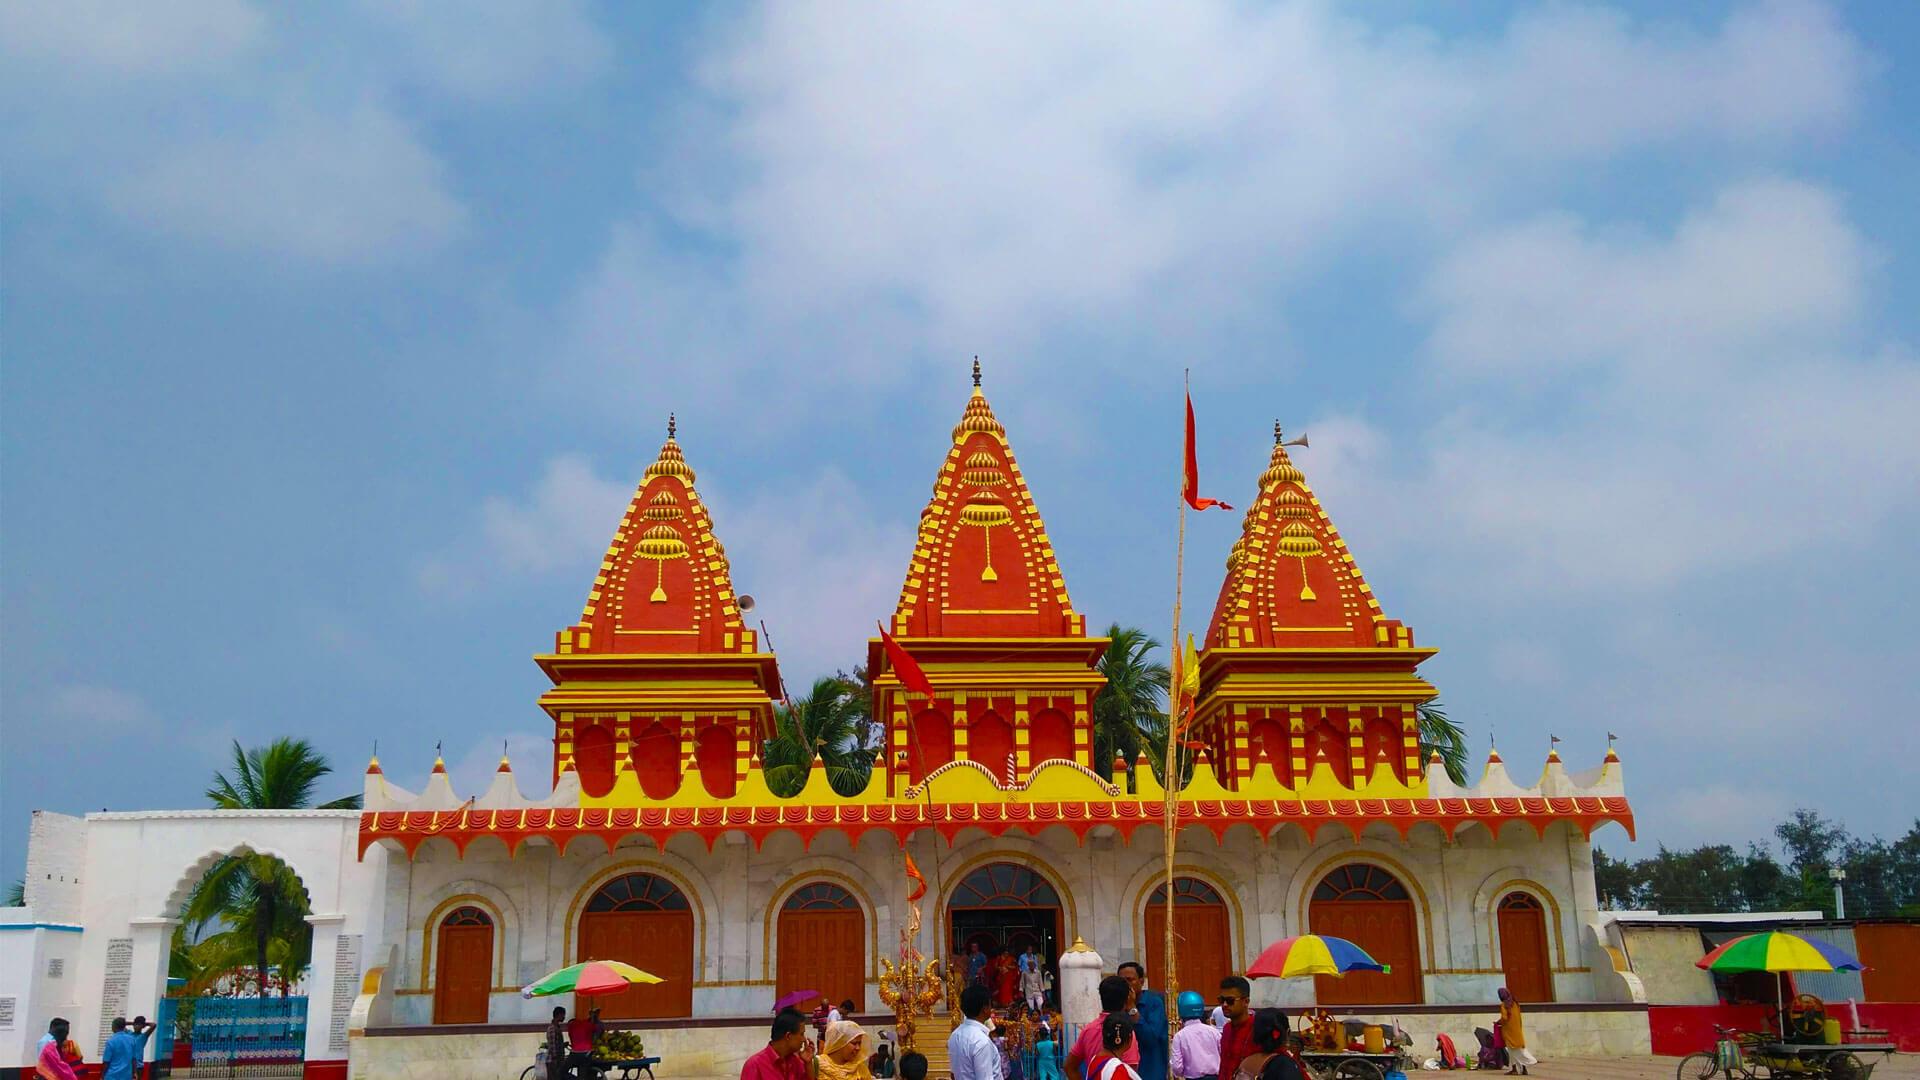 Ganga_Sagar_Mela_Attractions